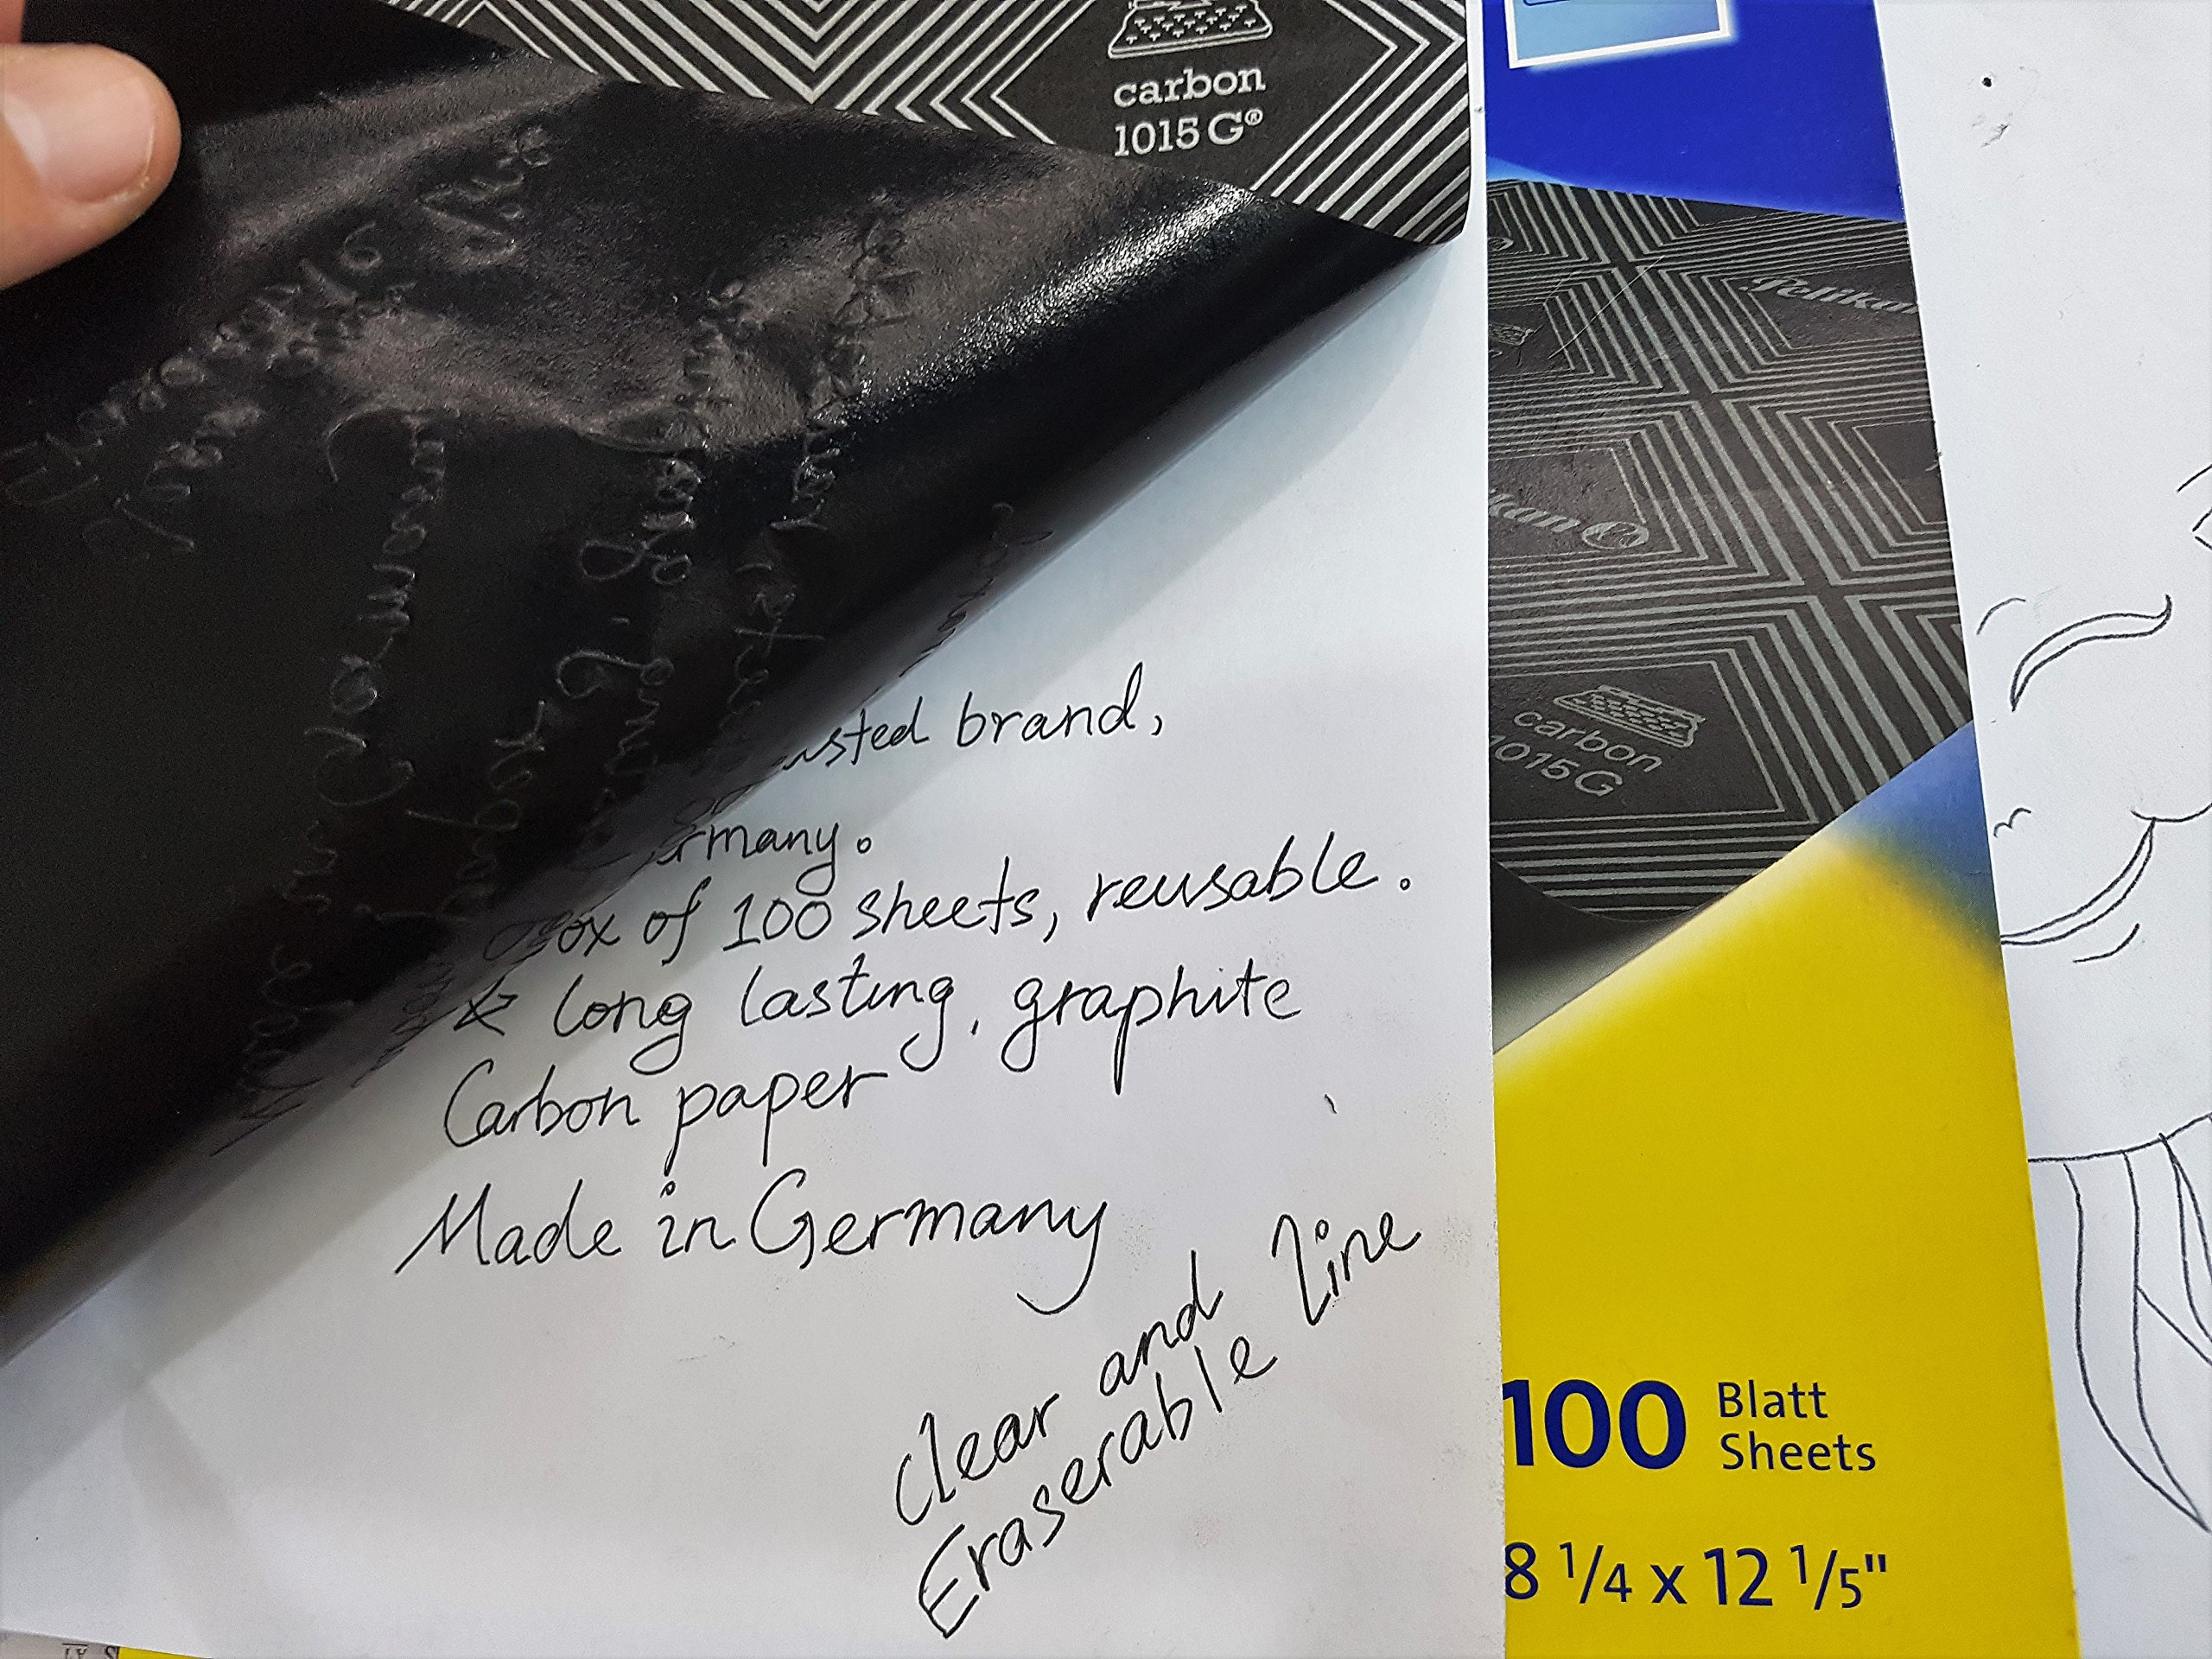 pelikan 100 sheets carbon transfer graphite tracing paper black